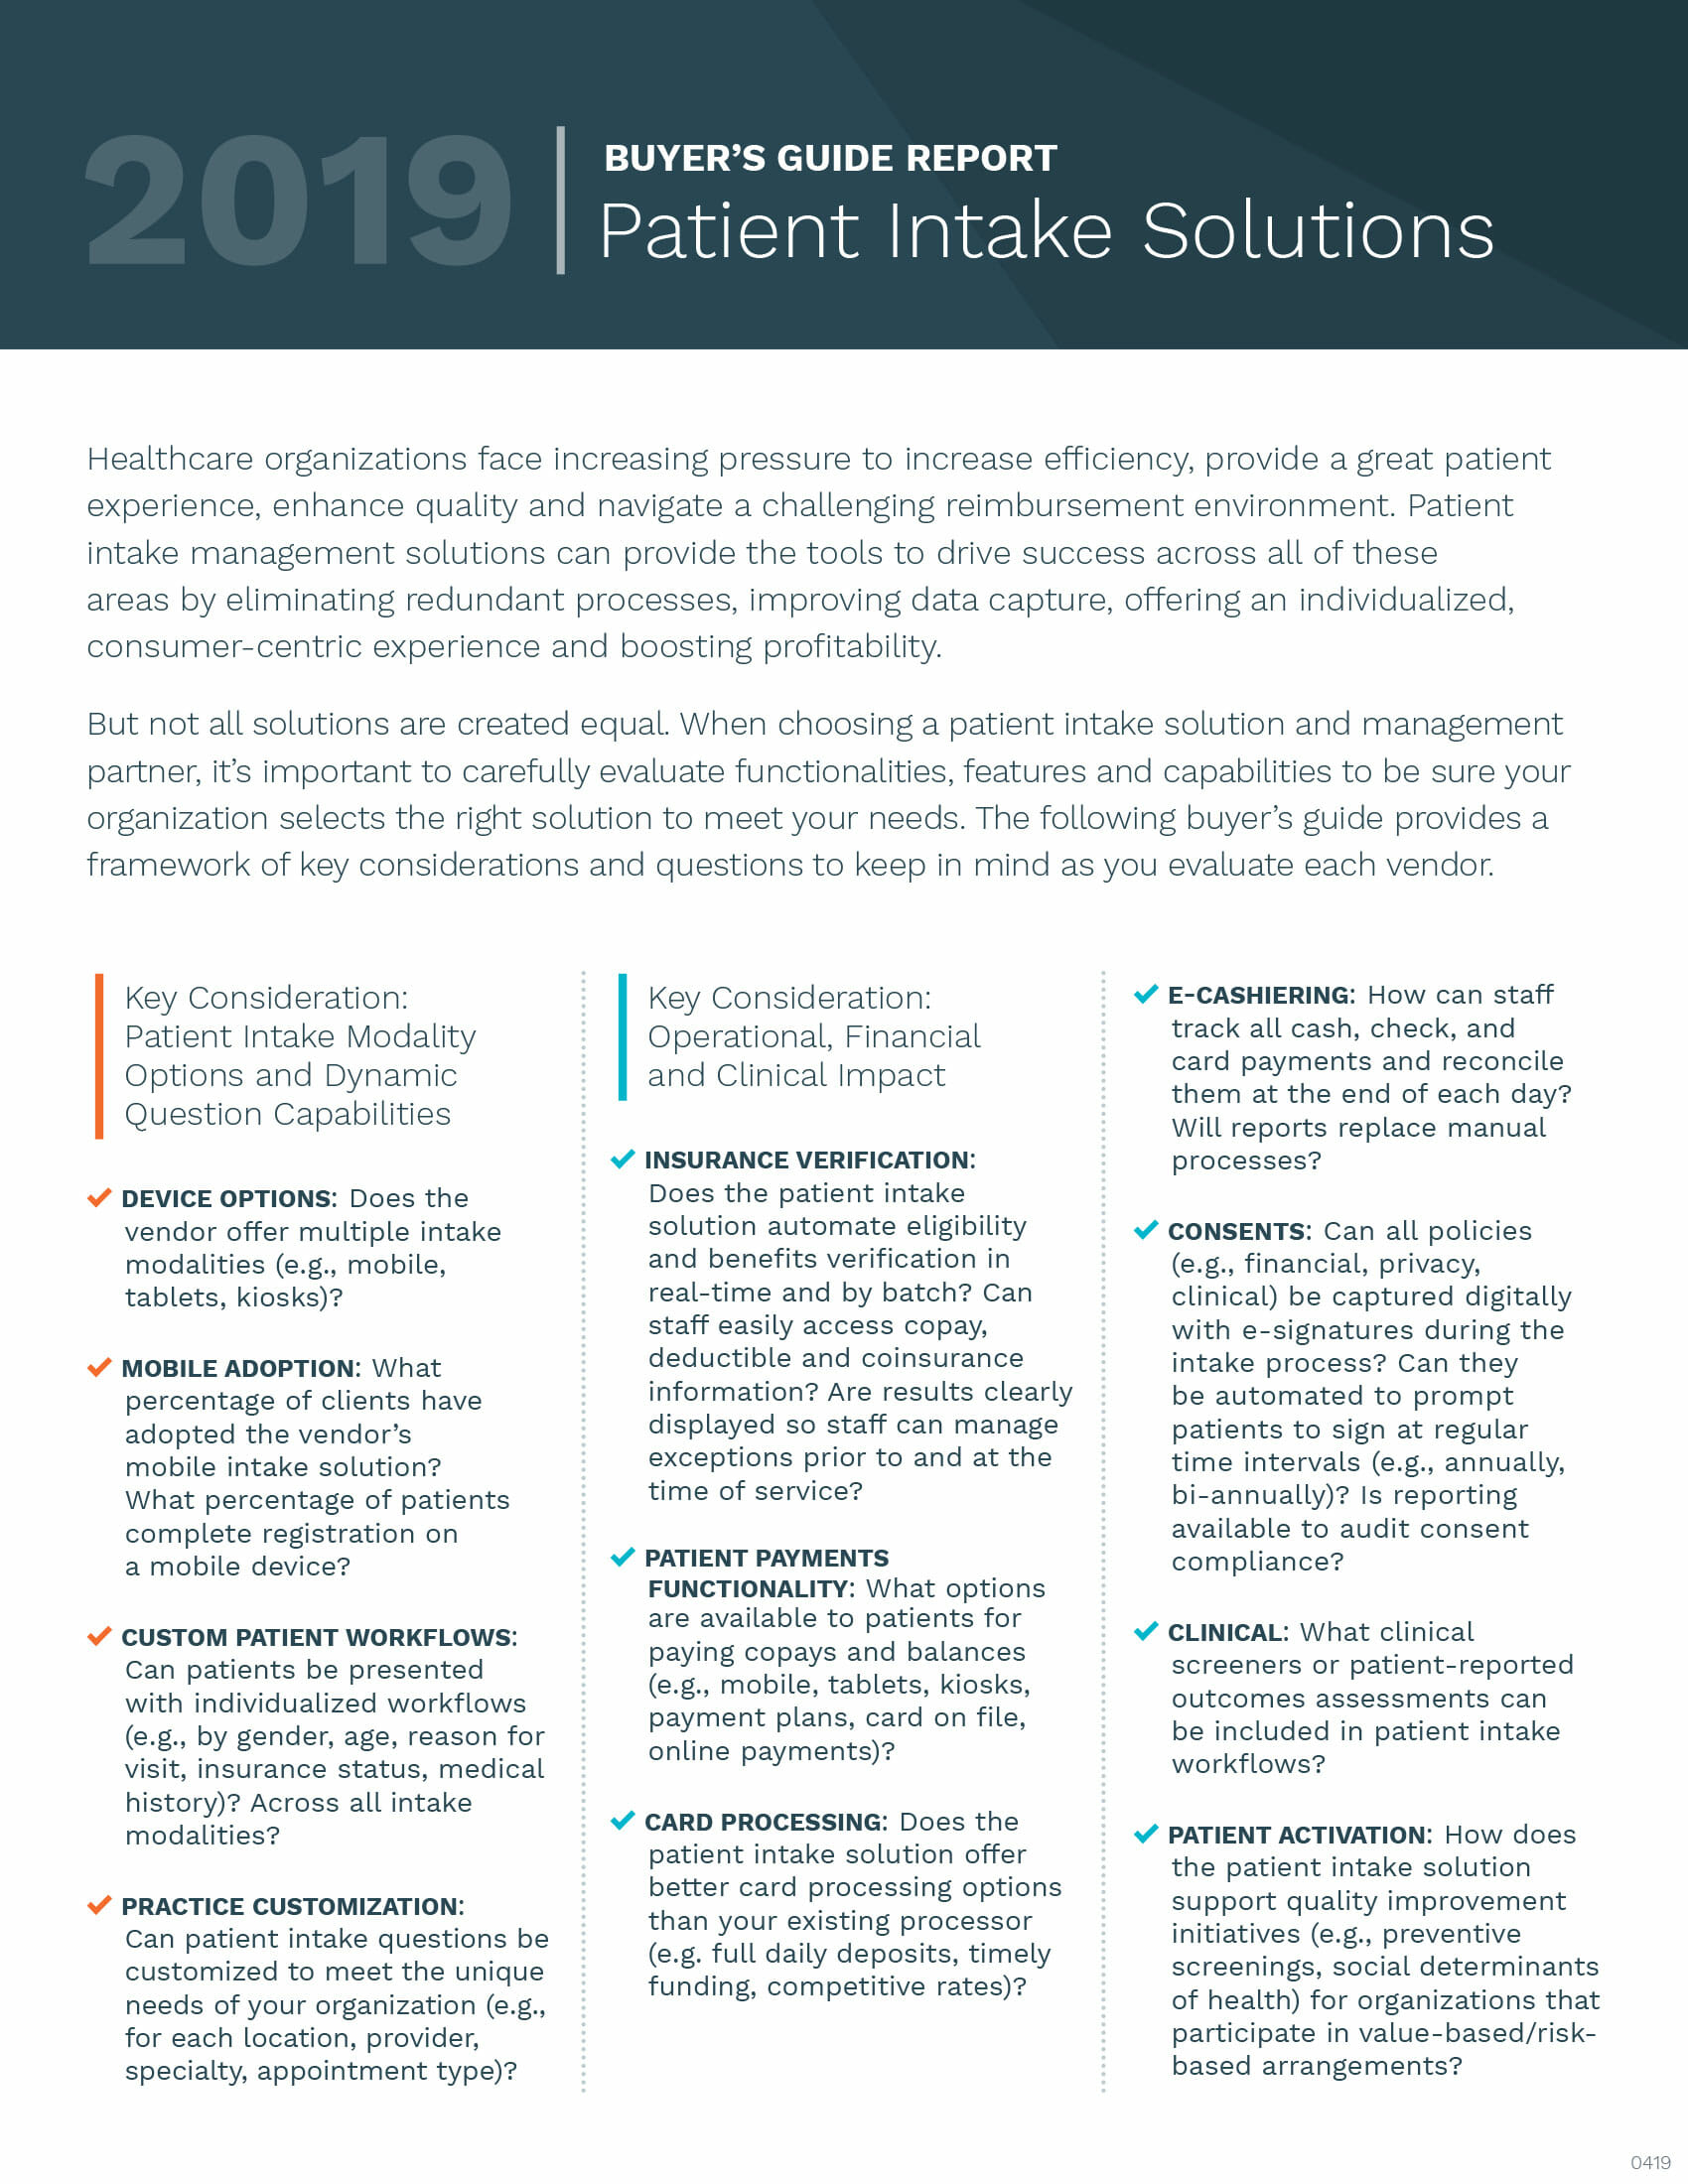 2019 Patient Intake Buyer's Guide | Phreesia